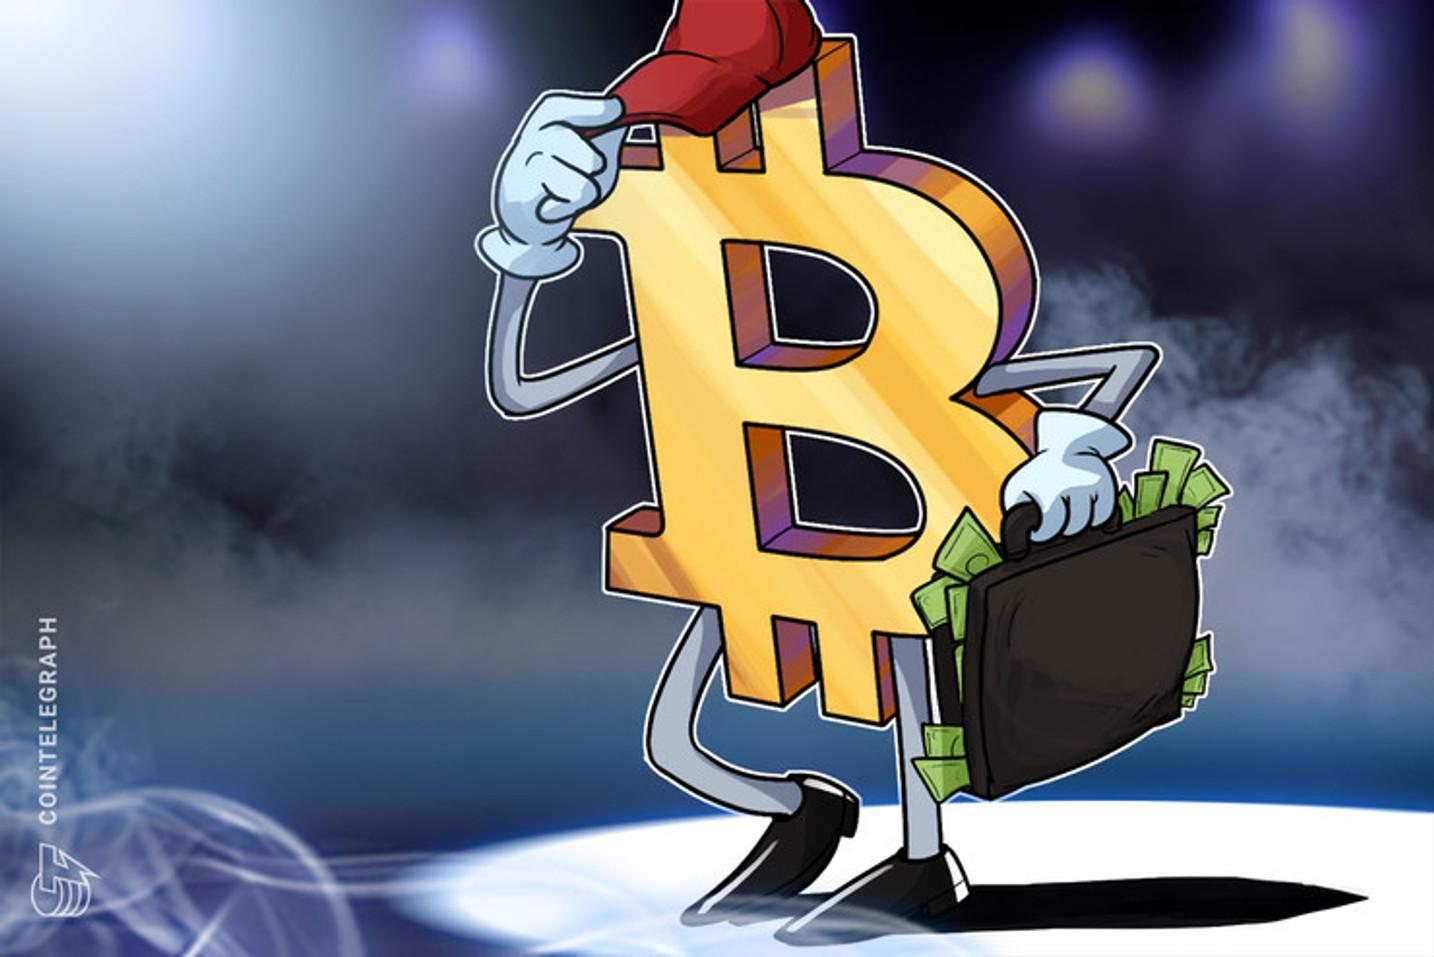 Mercado Libre compra Bitcoin por primera vez como parte de su estrategia de tesorería